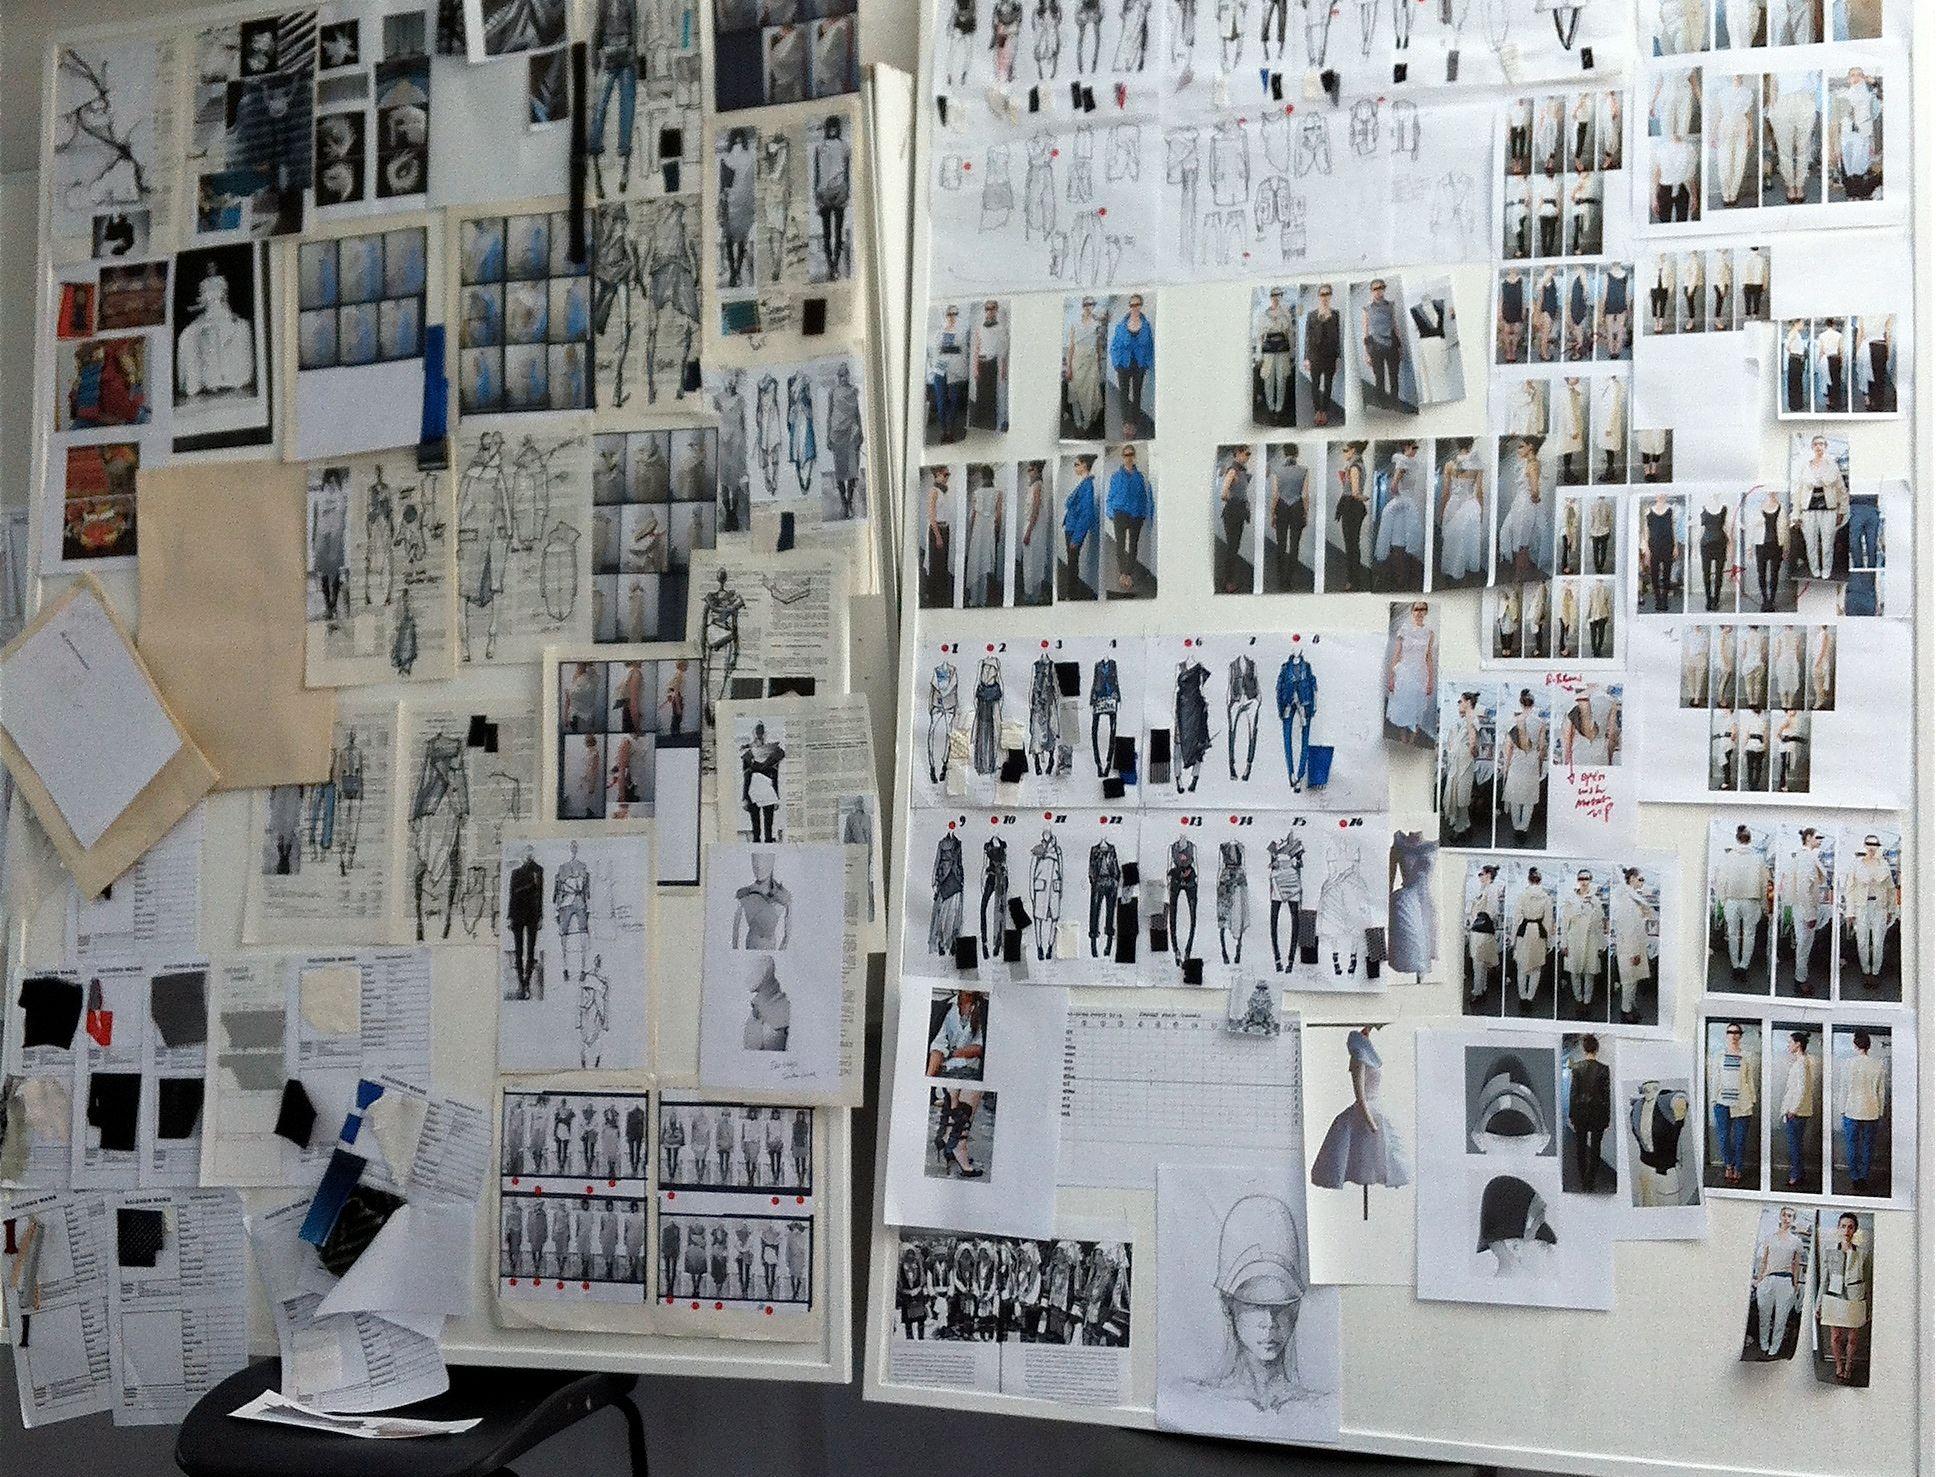 Set The Mood Mood Board Fashion Design Studio Workspace